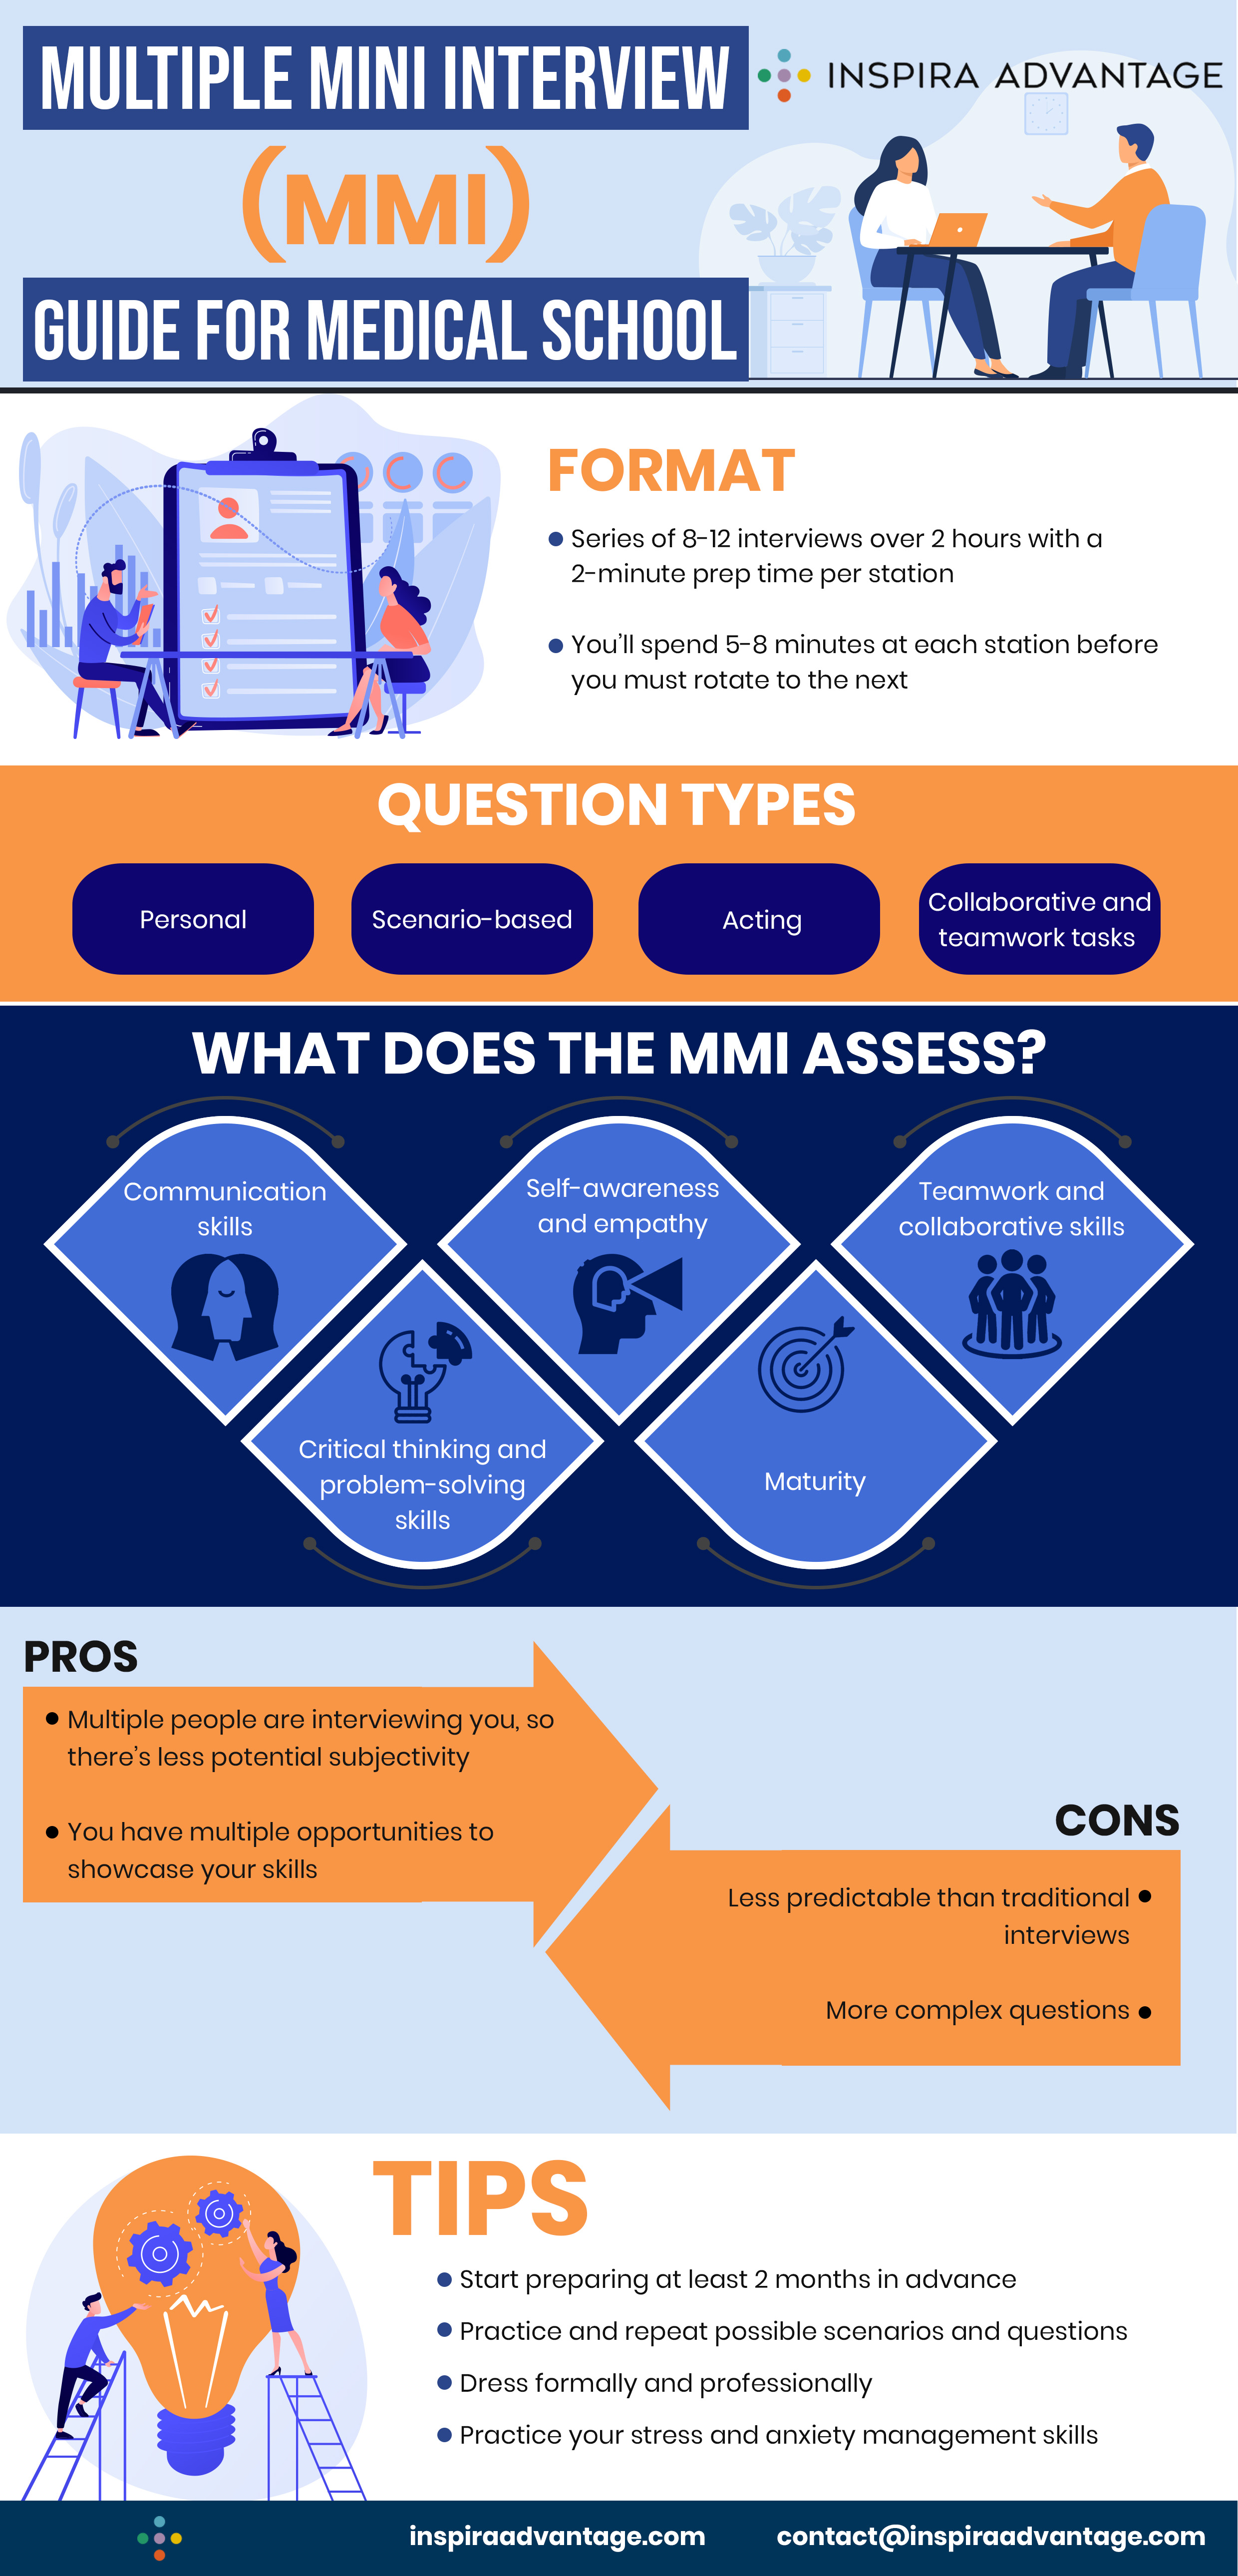 MMI Guide for Medical School